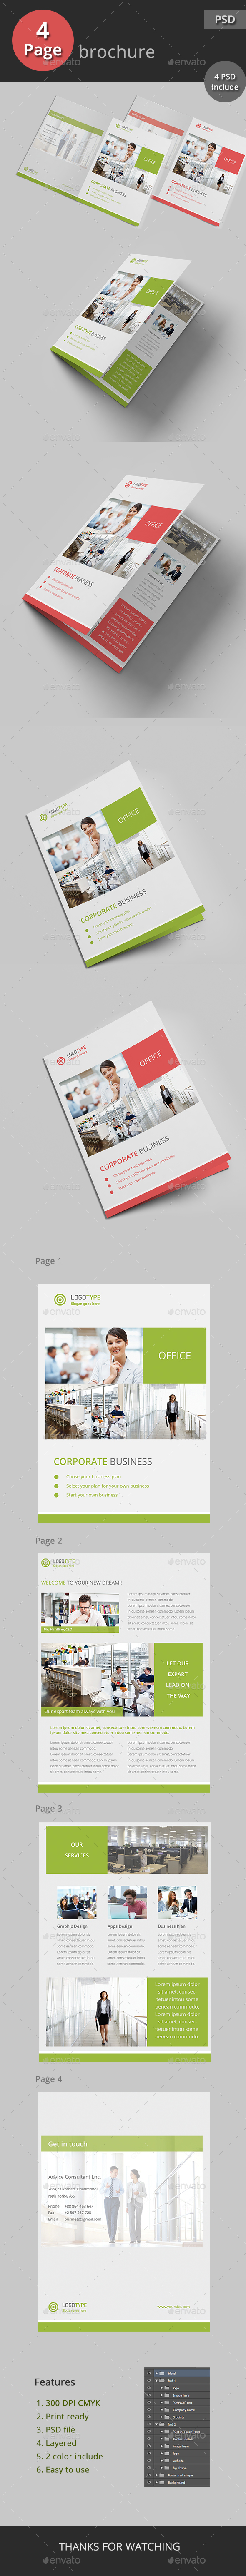 Business Bifold Brochure - Brochures Print Templates